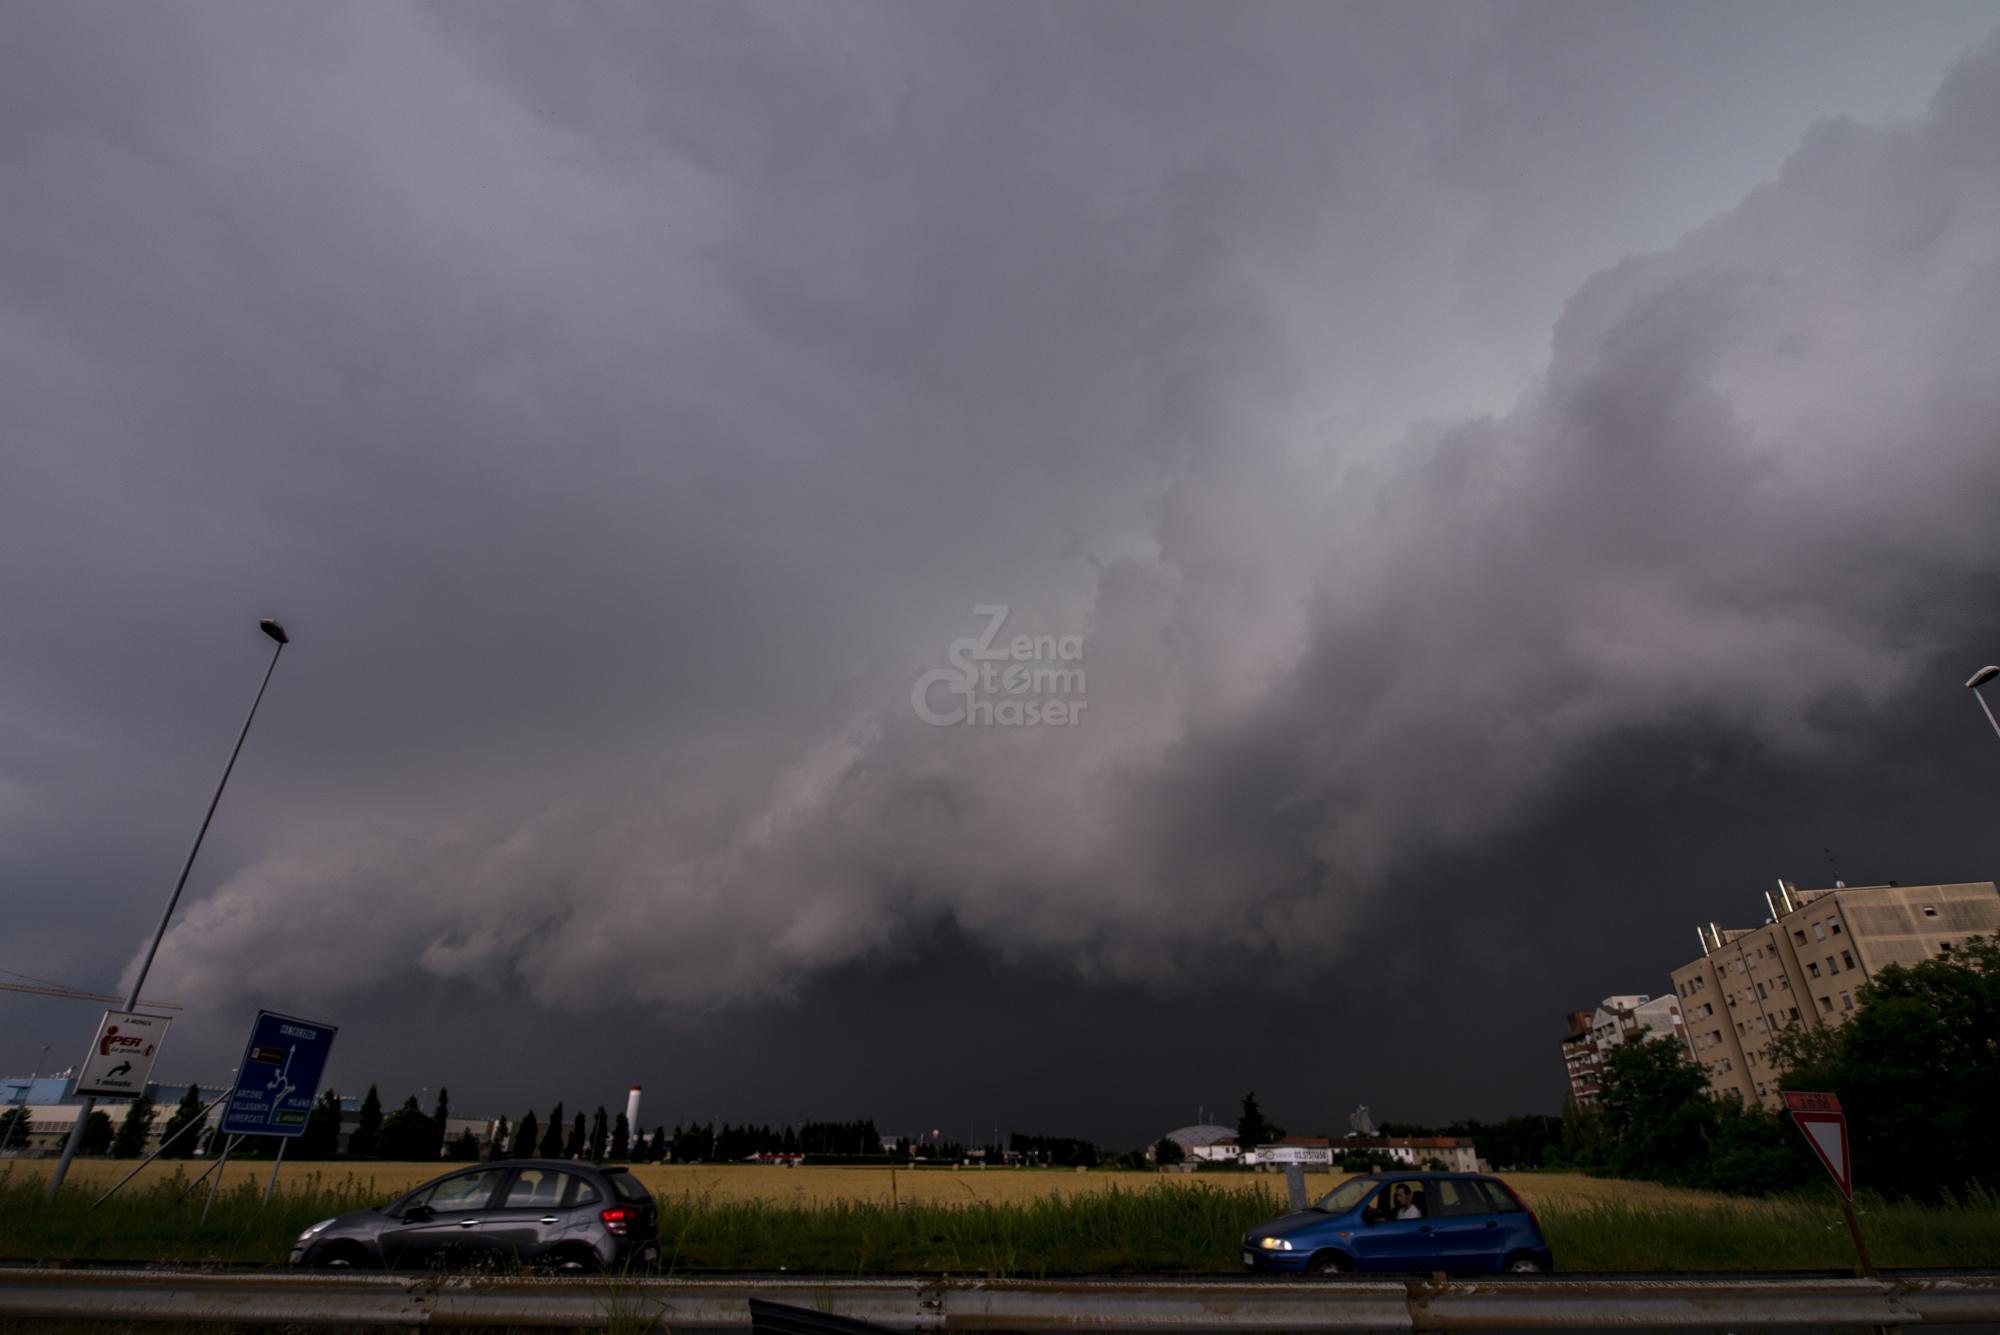 Monza Milano, sabato 2 luglio_1 shelf cloud